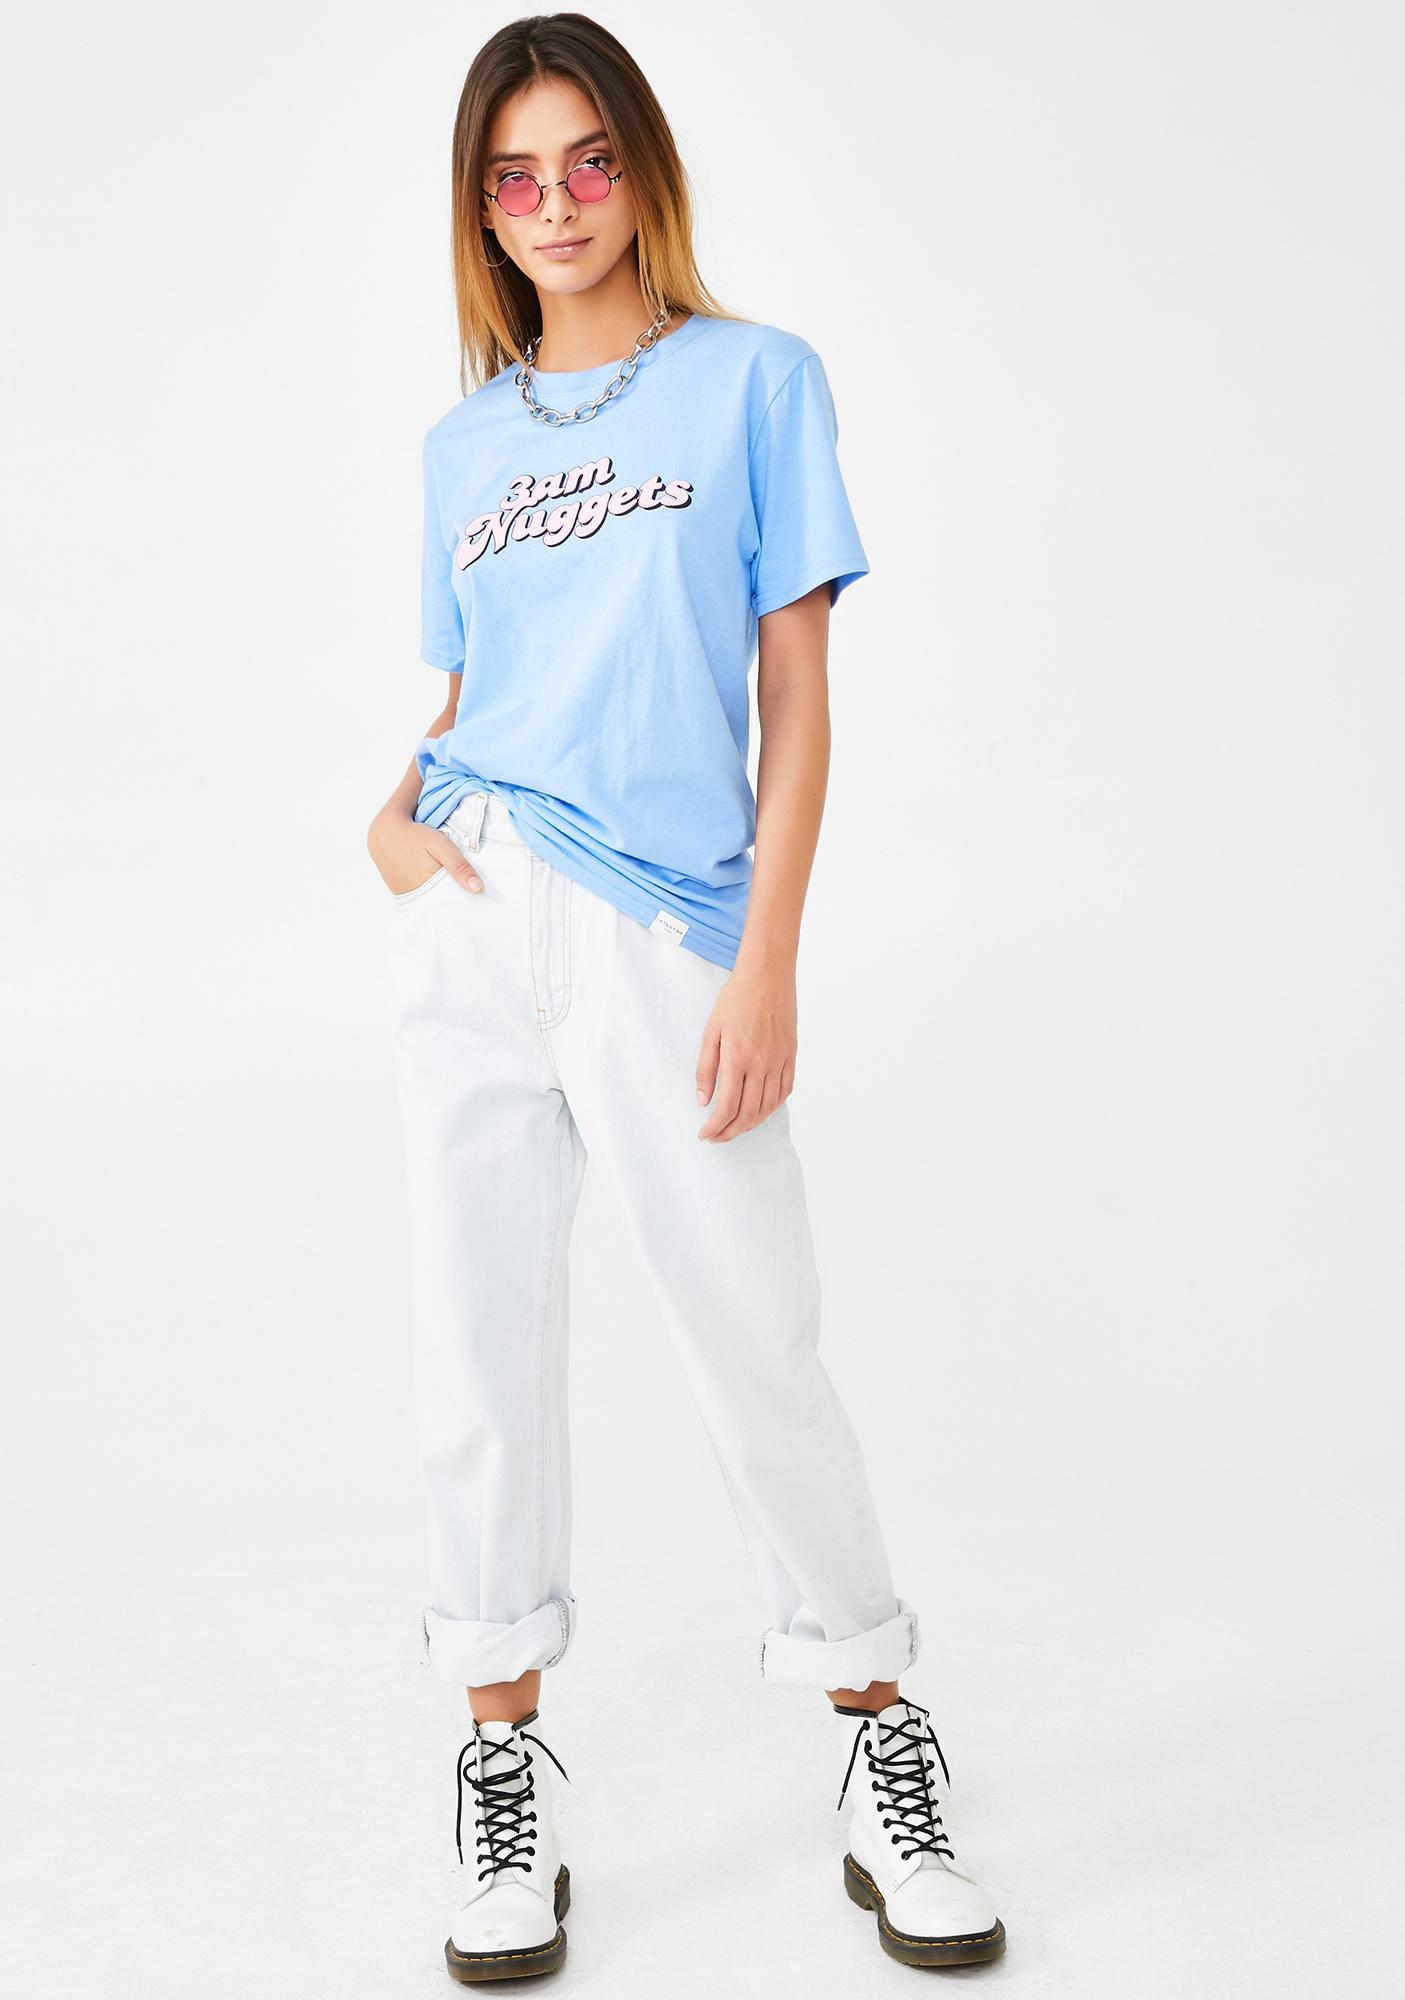 Skinnydip 3am Nuggets T-Shirt